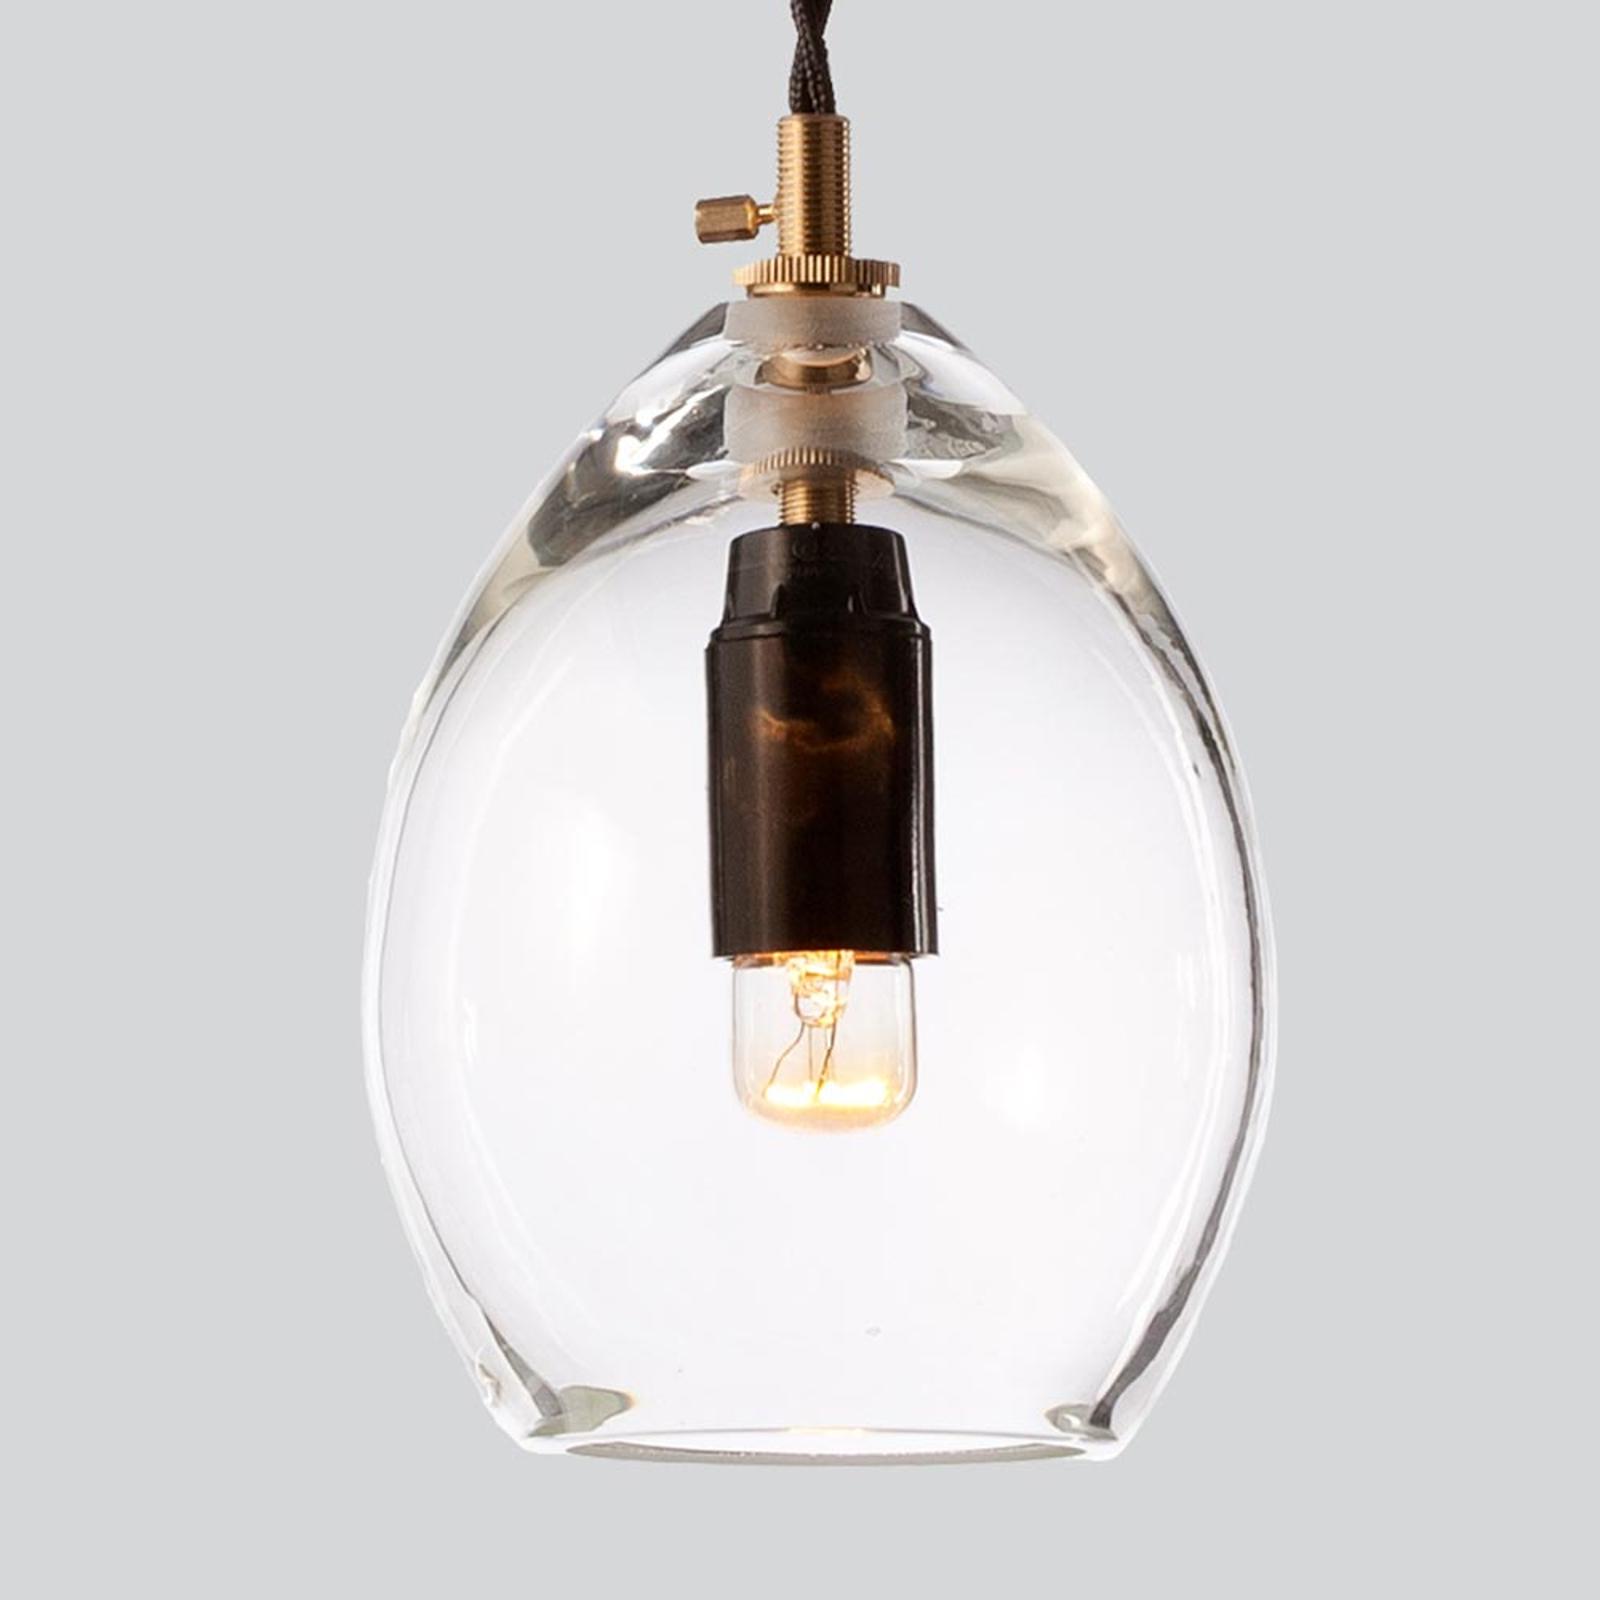 Kirkas design-lasiriippuvalaisin Unika, 10,5cm